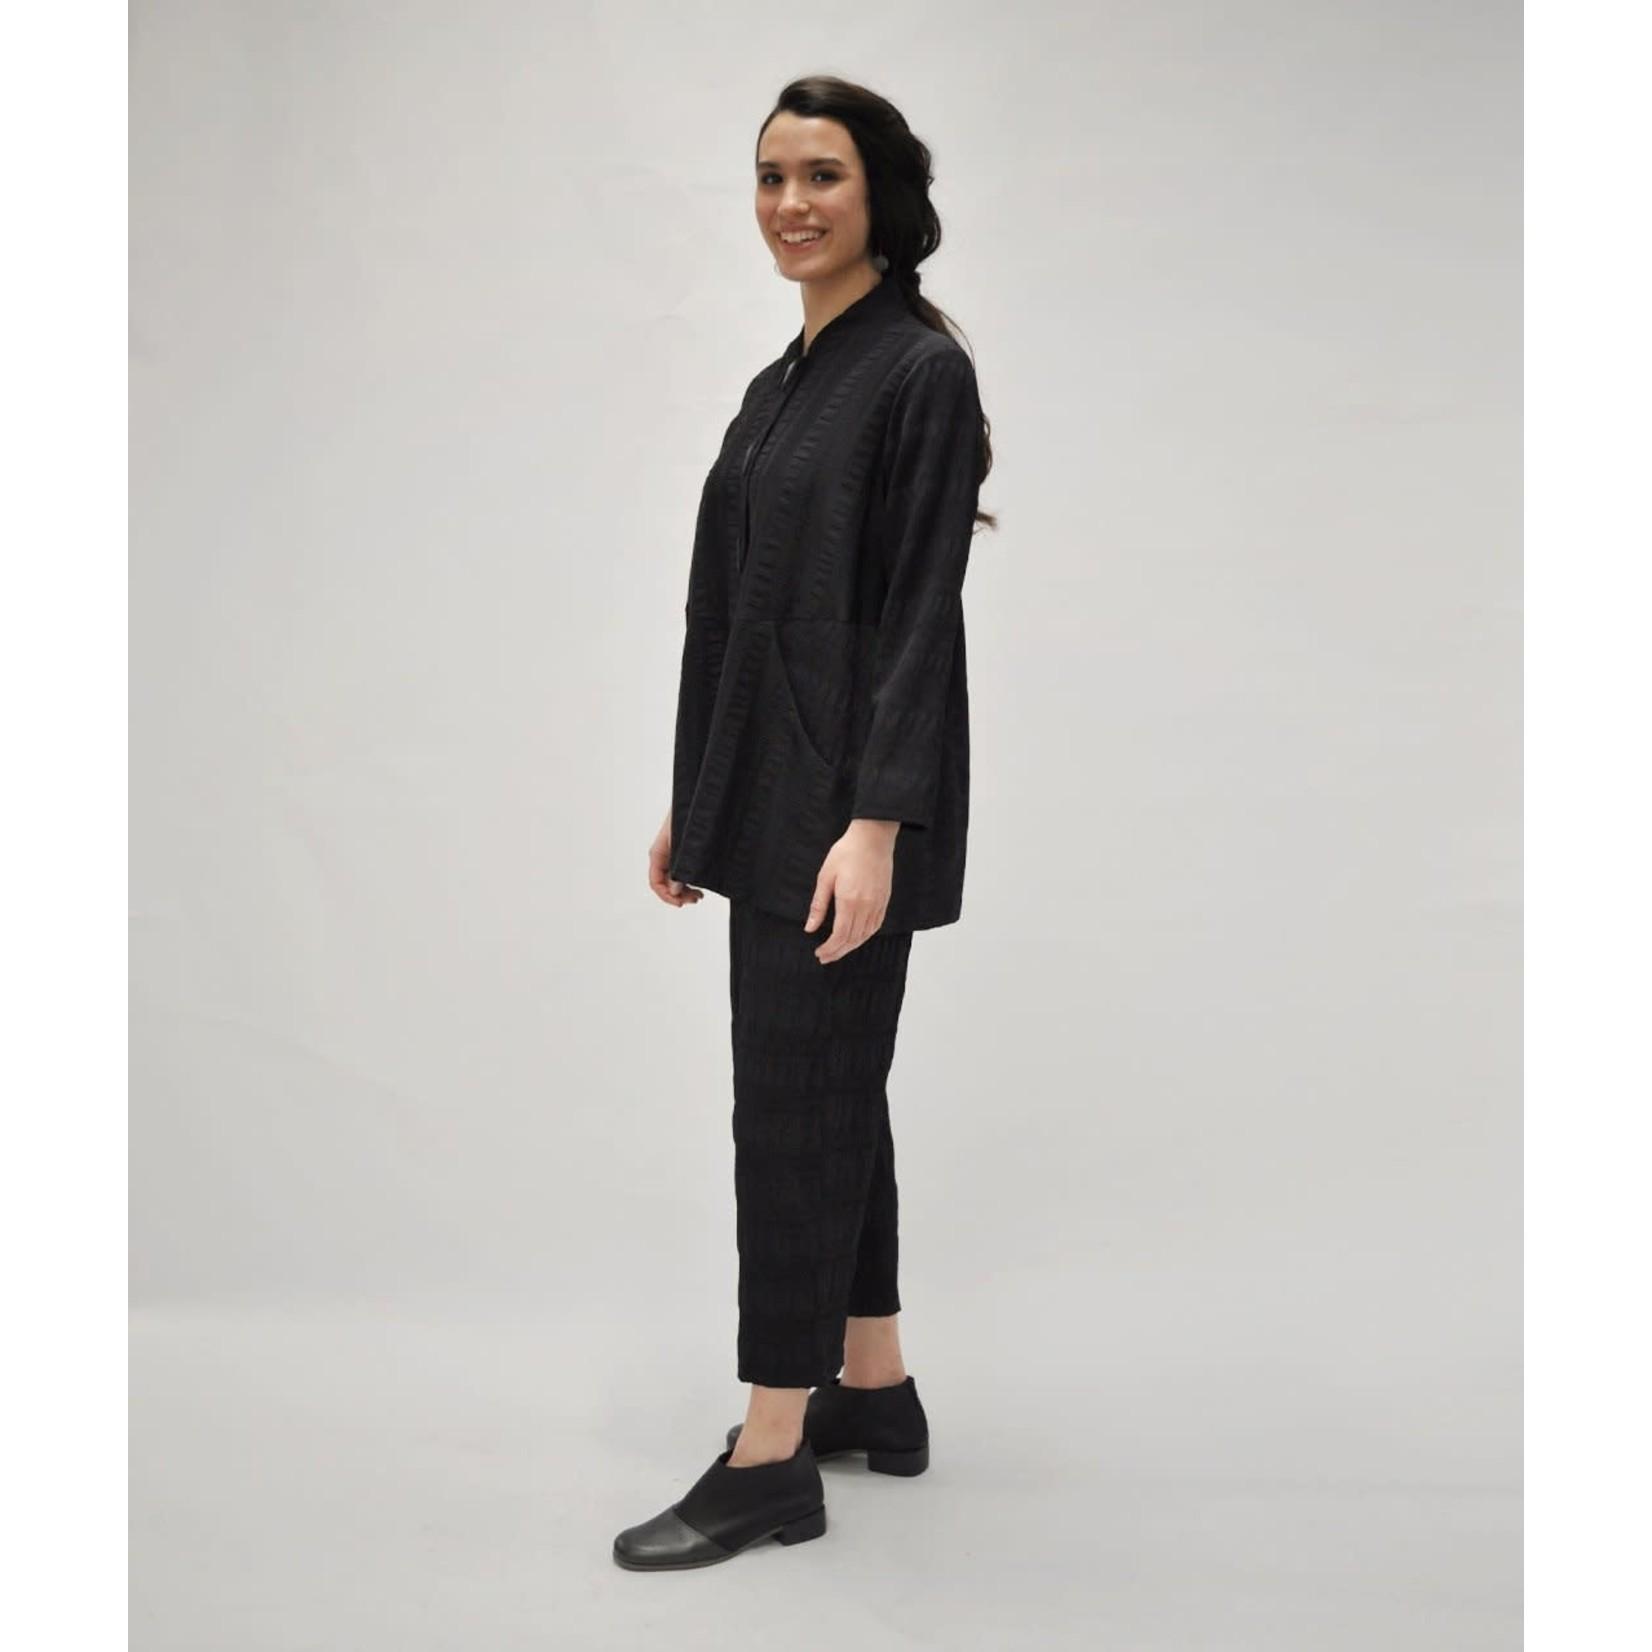 Niche Crinkle Line Jacket in Black